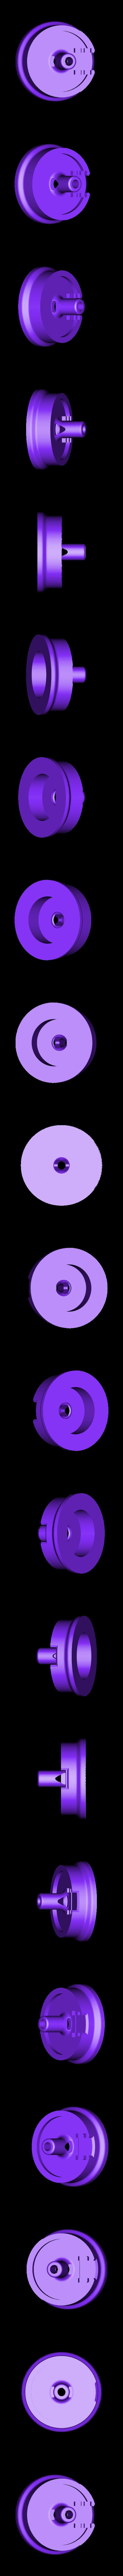 bottom.stl Download free STL file Shining Lantern • 3D printer object, blecheimer